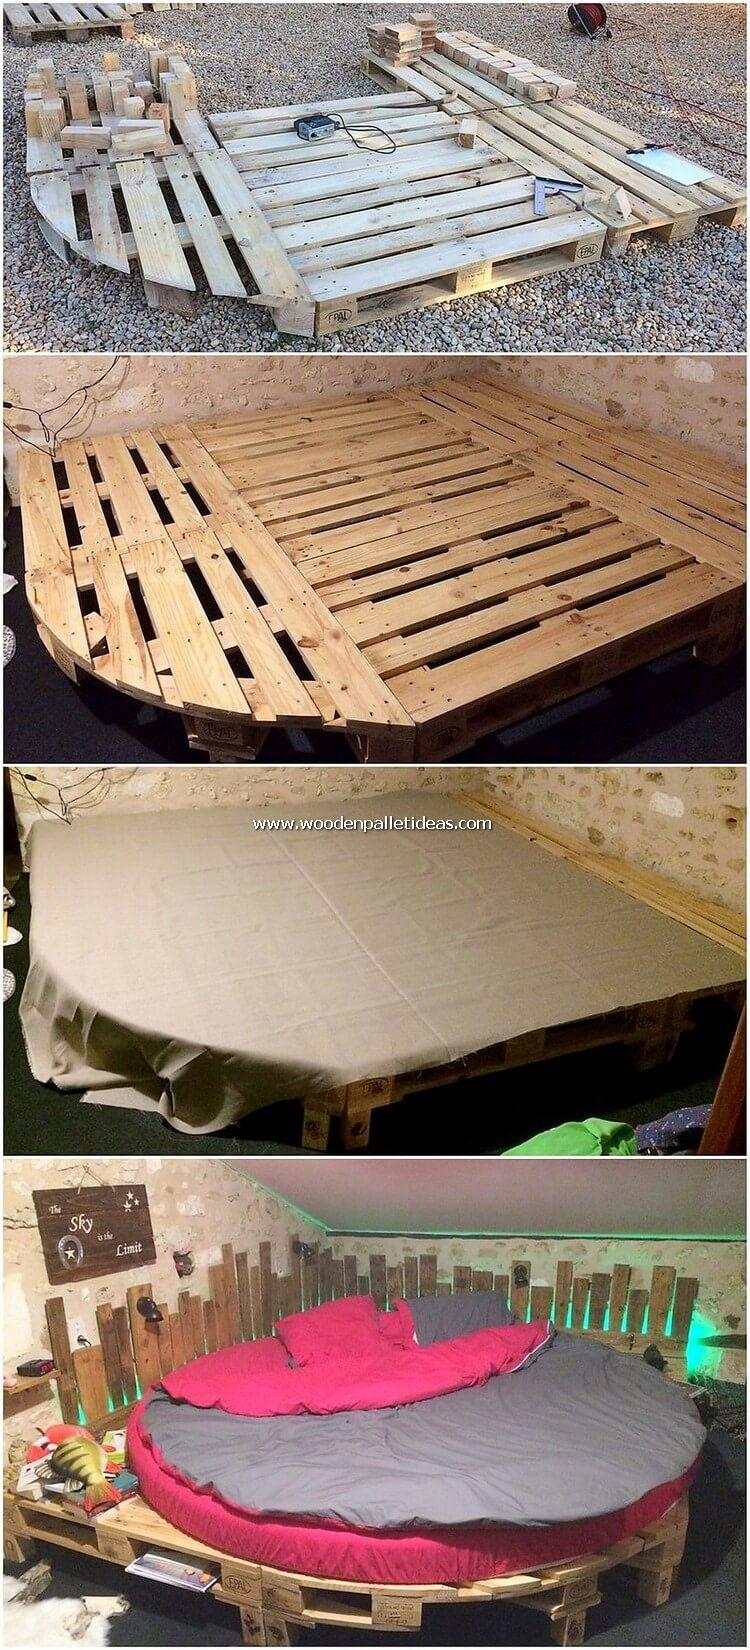 DIY Wood Pallet BEd